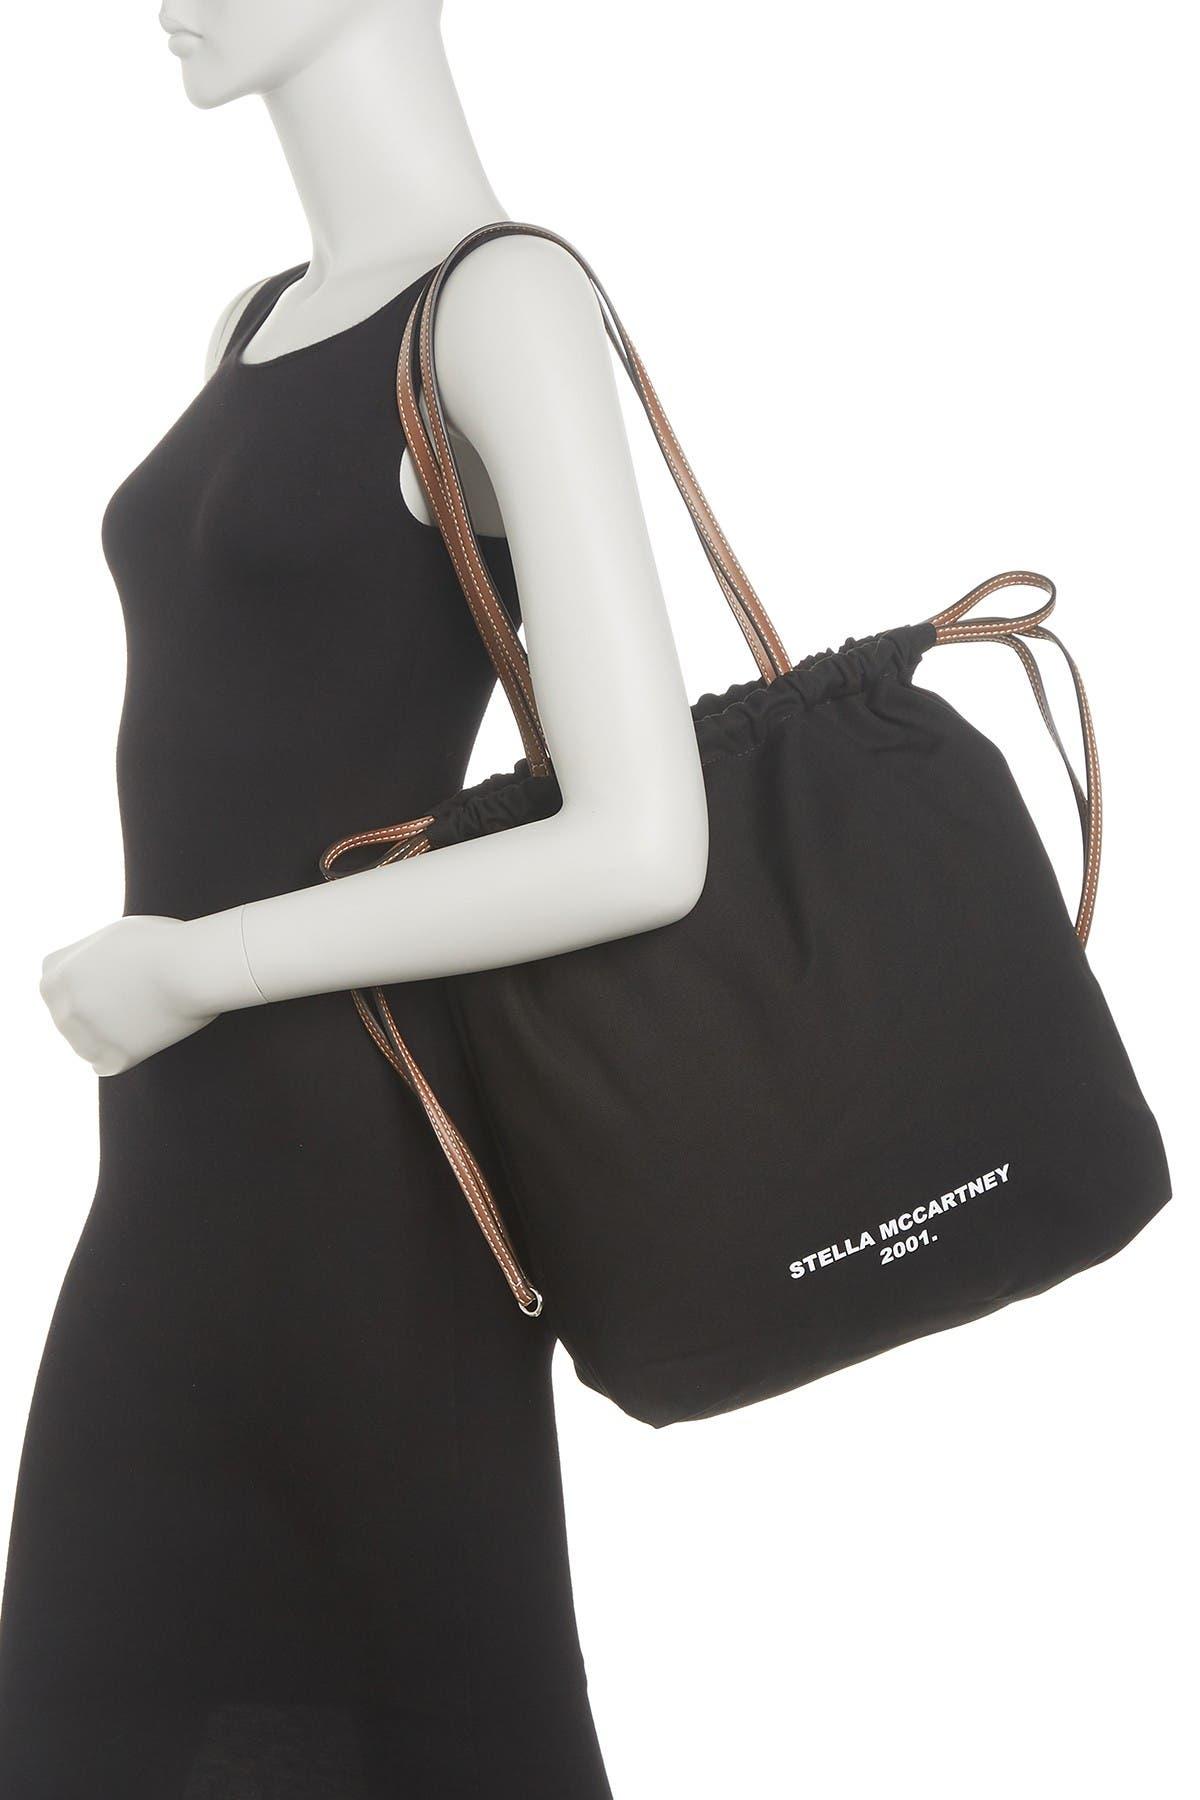 Image of Stella McCartney Eco Cotton Simple Tote Bag